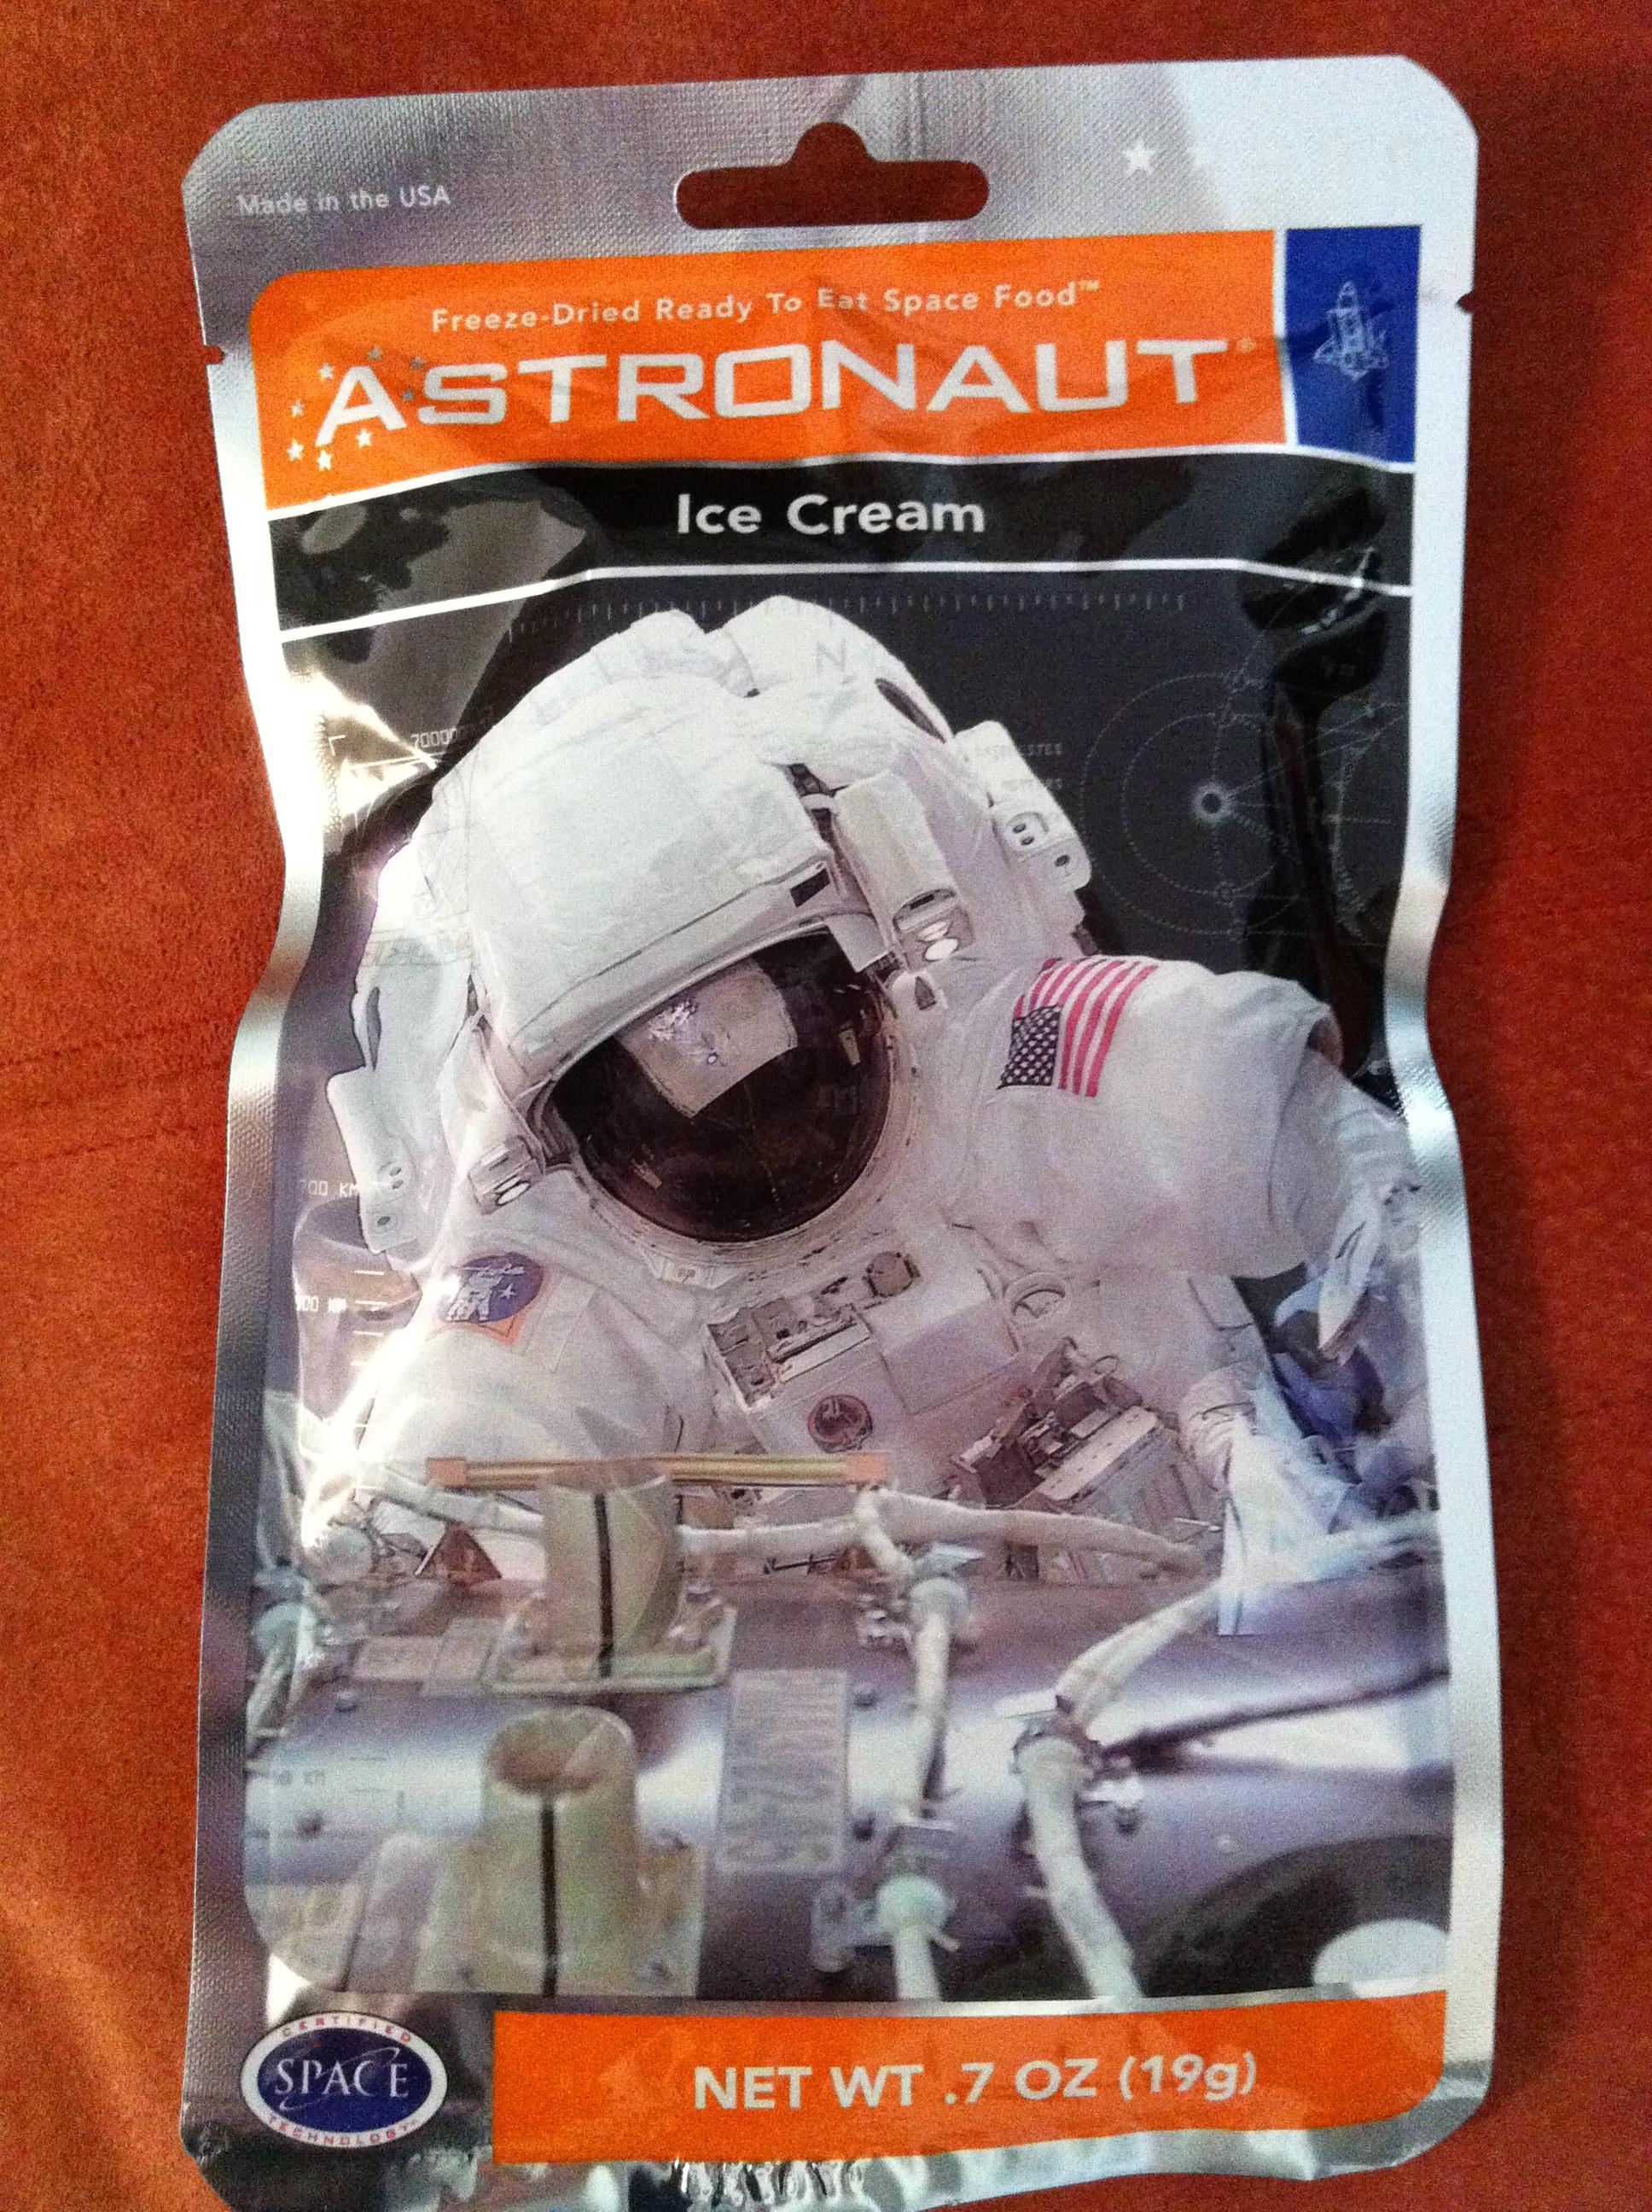 walmart astronaut ice cream - photo #16